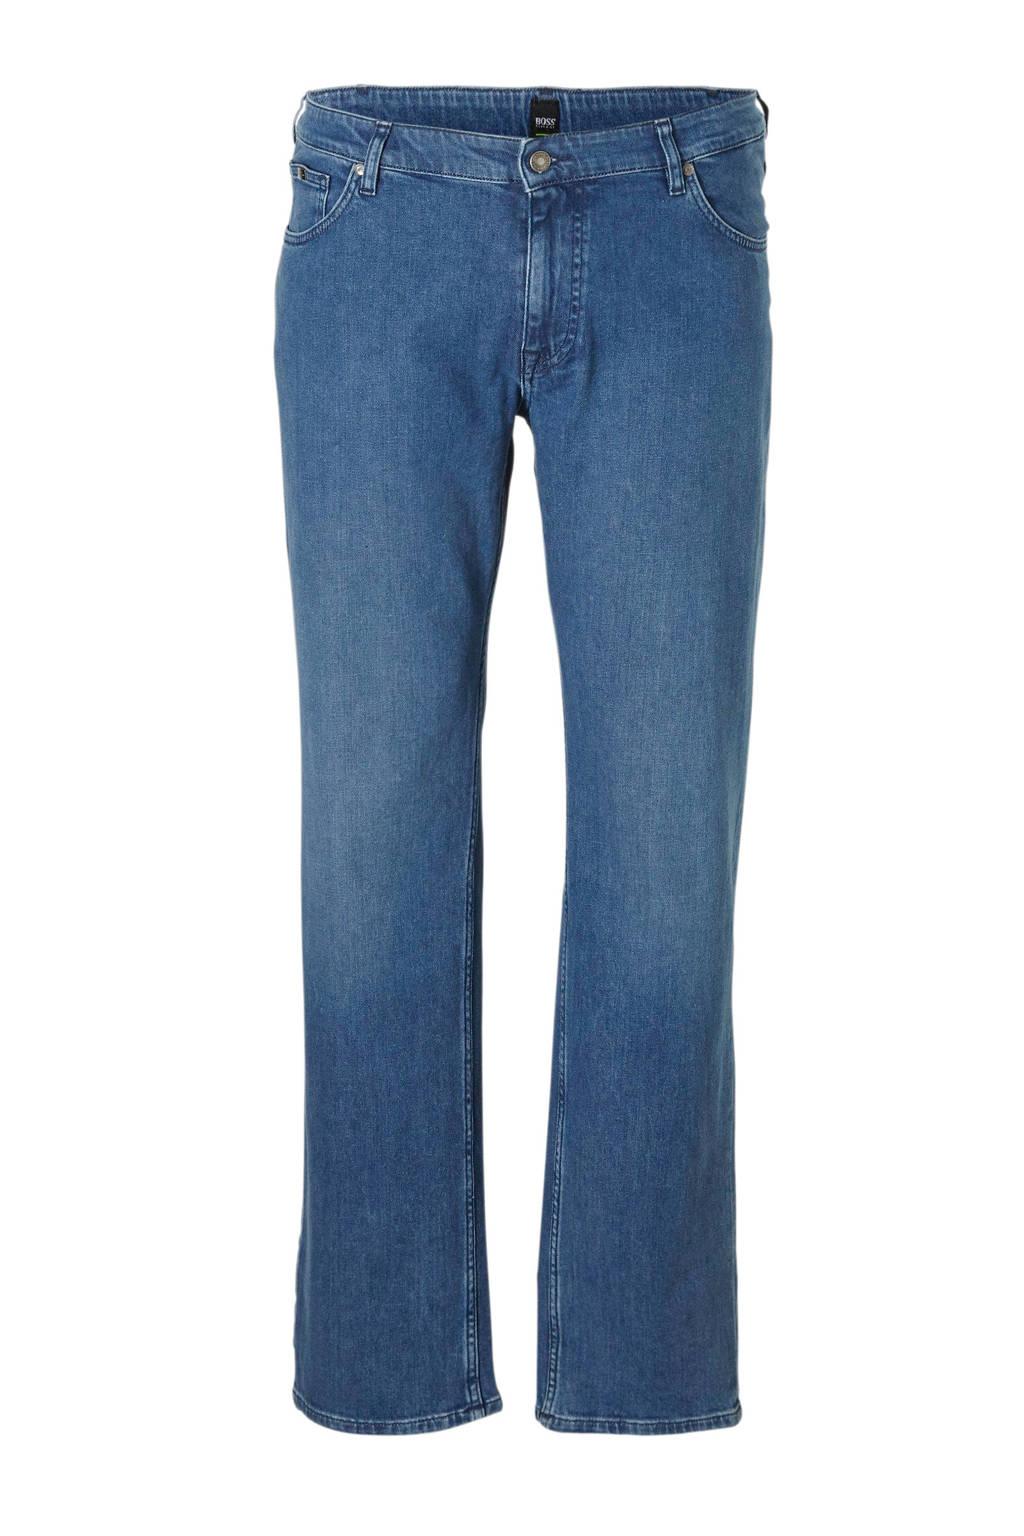 Boss Athleisure regular fit jeans, Blue denim